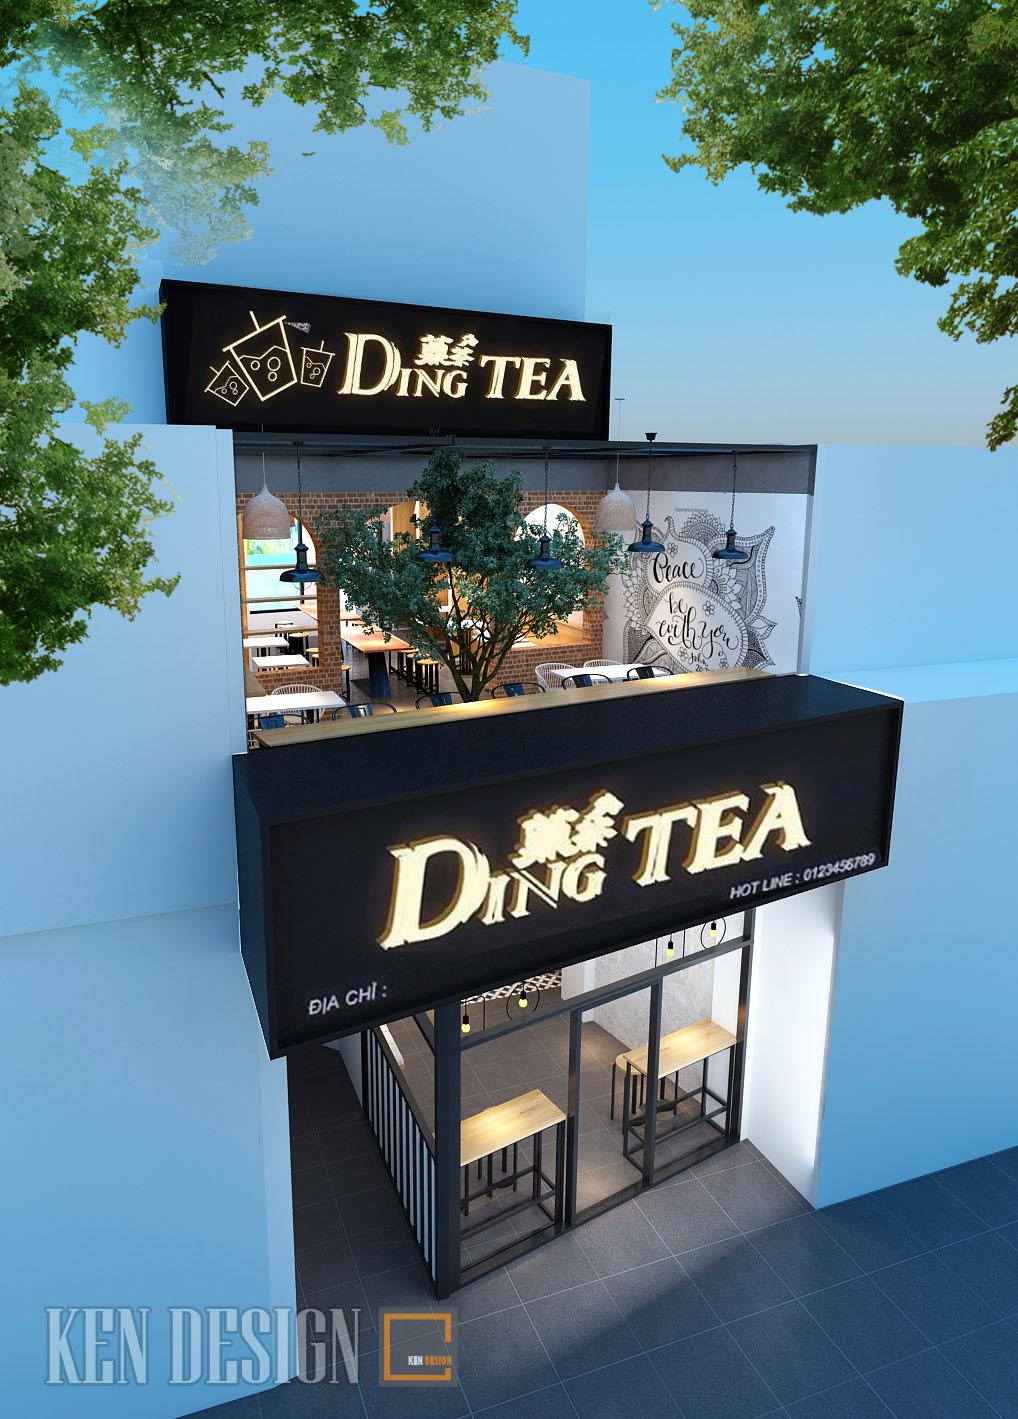 Trà Sữa Ding Tea - Cần Thơ